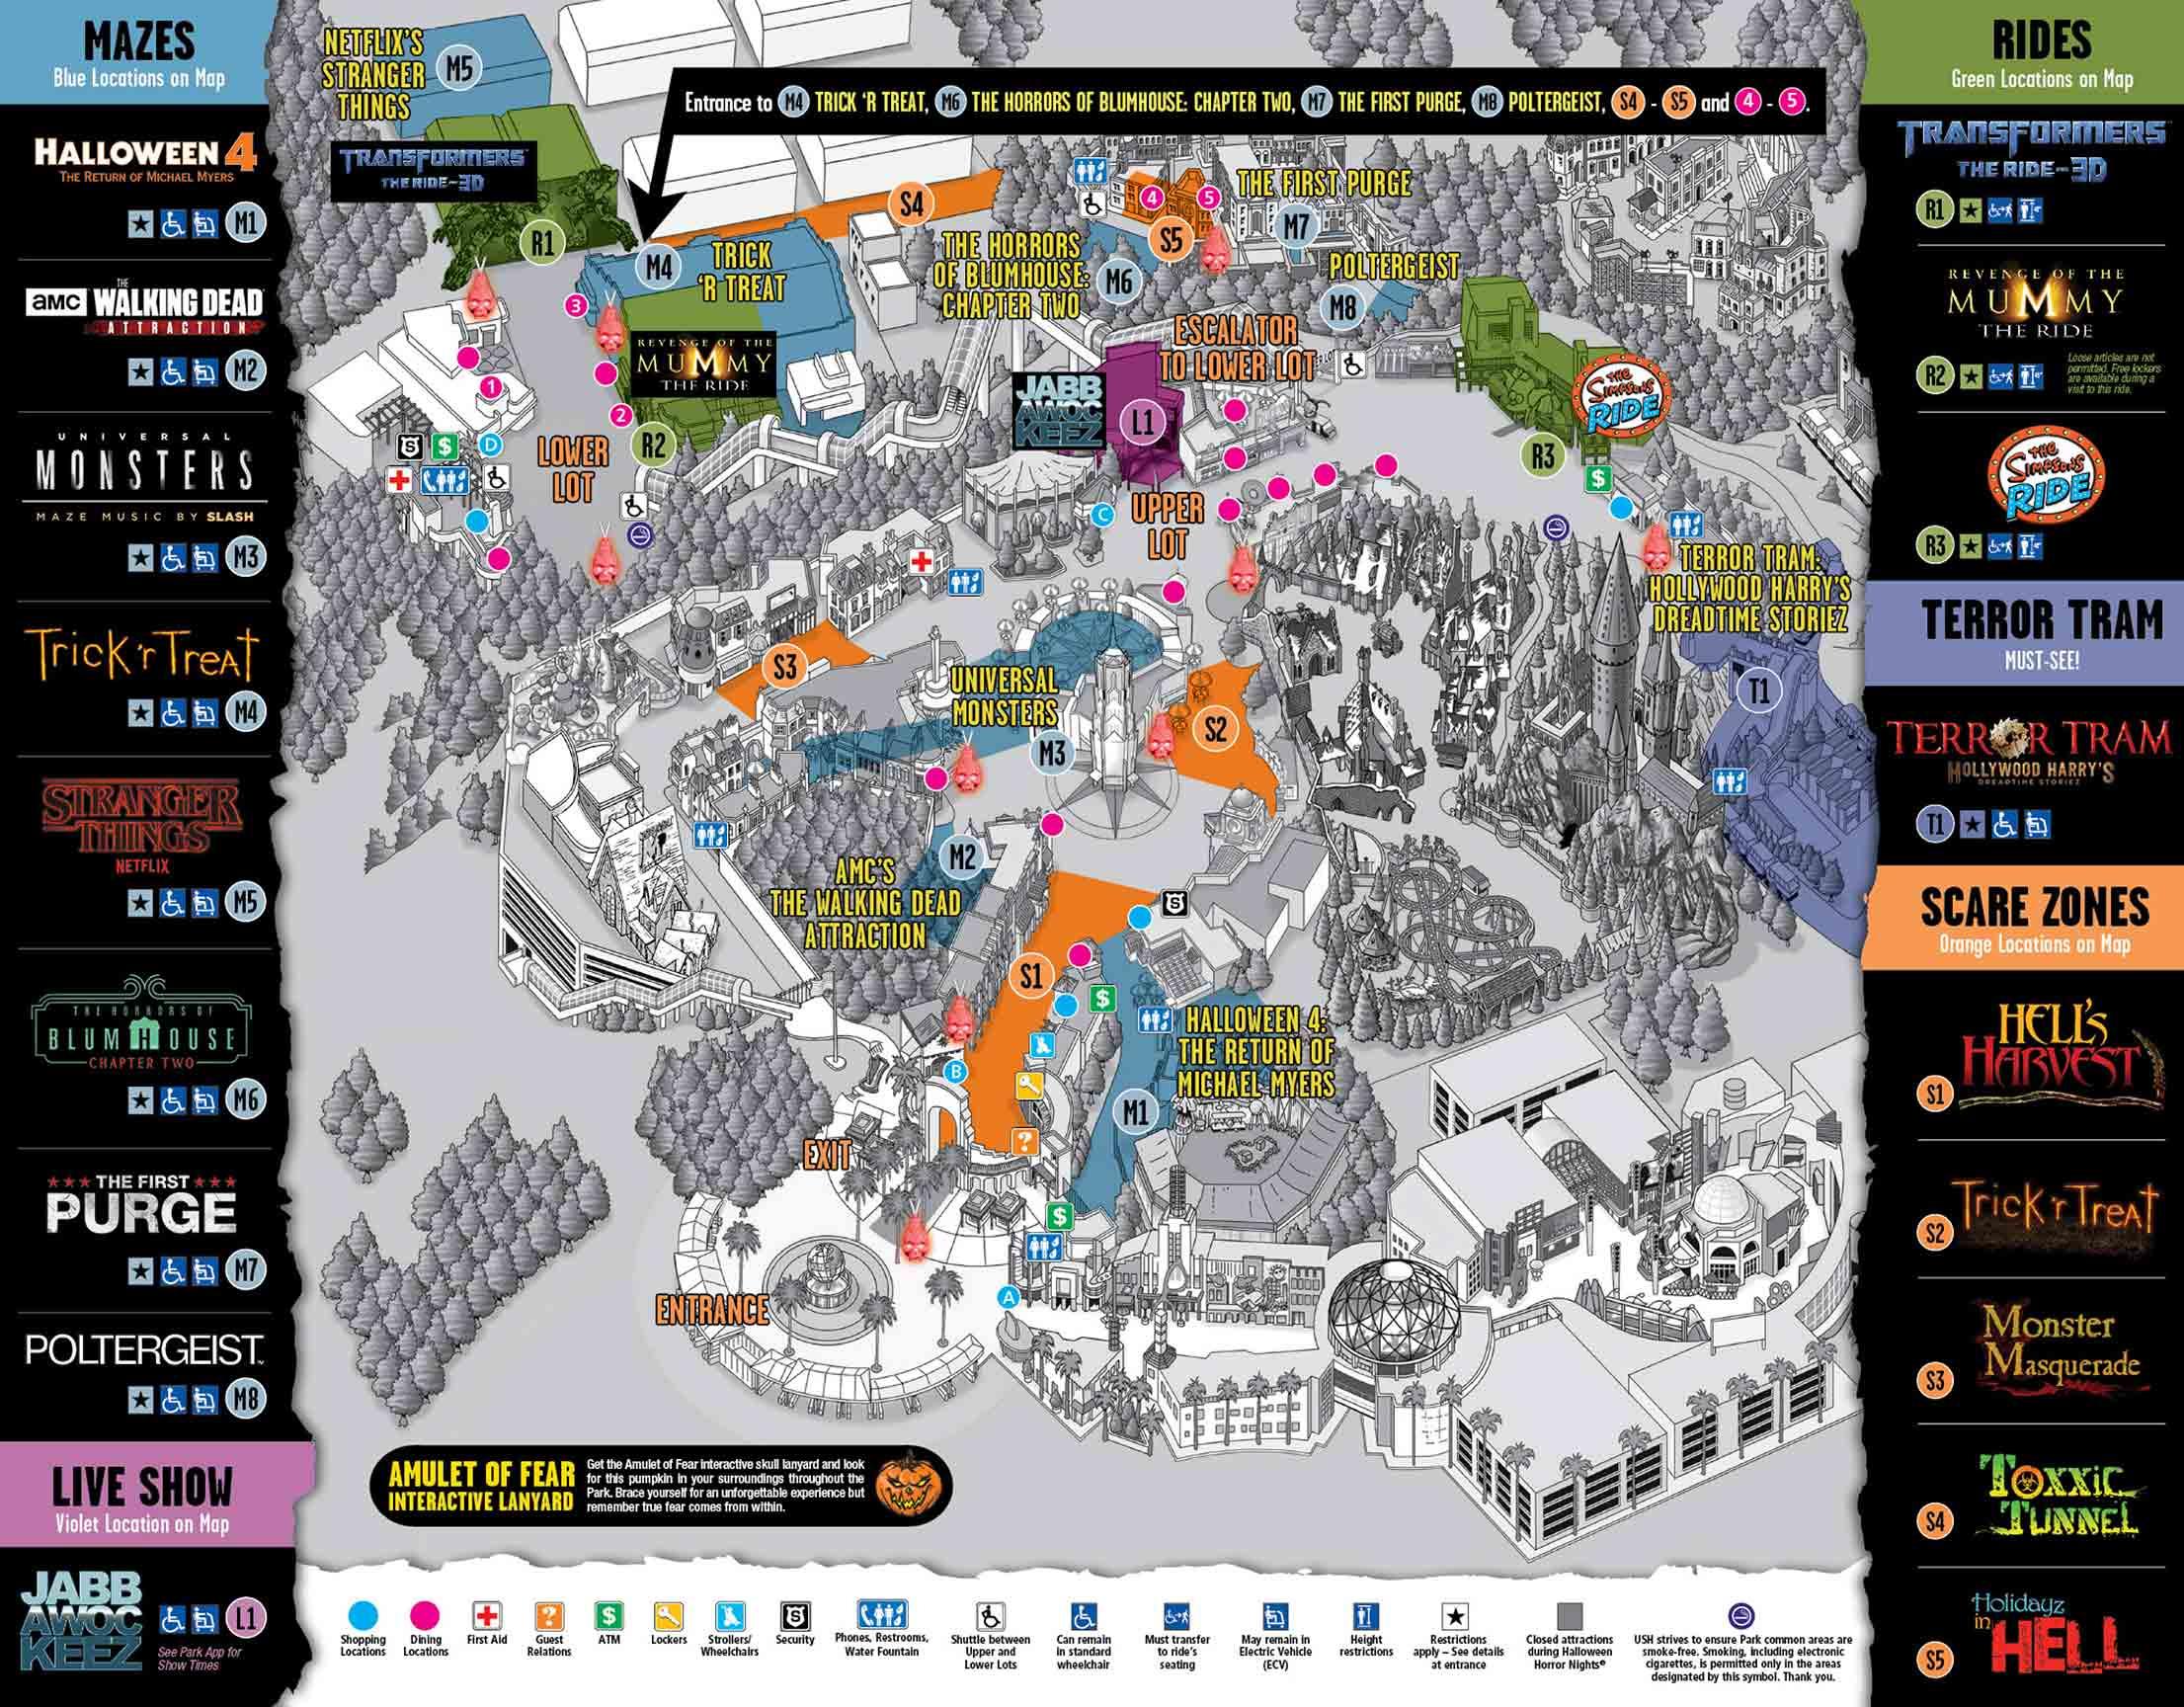 Park Map - Universal Studios Hollywood: Halloween Horror Nights - Universal Studios California Map Of Park